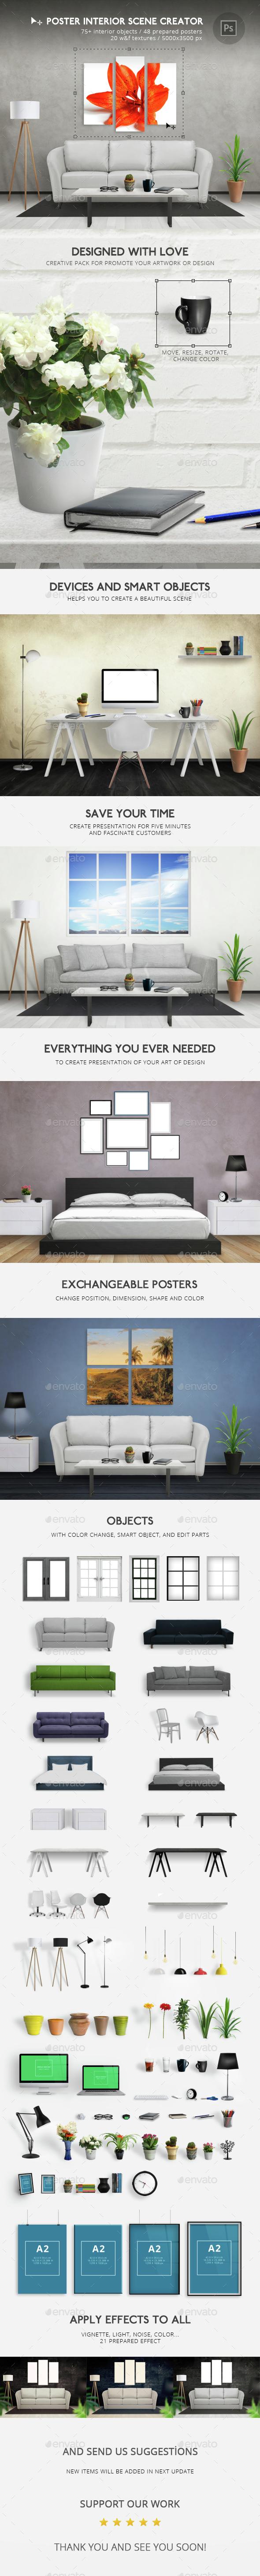 Poster Interior Scene Creator - Posters Print